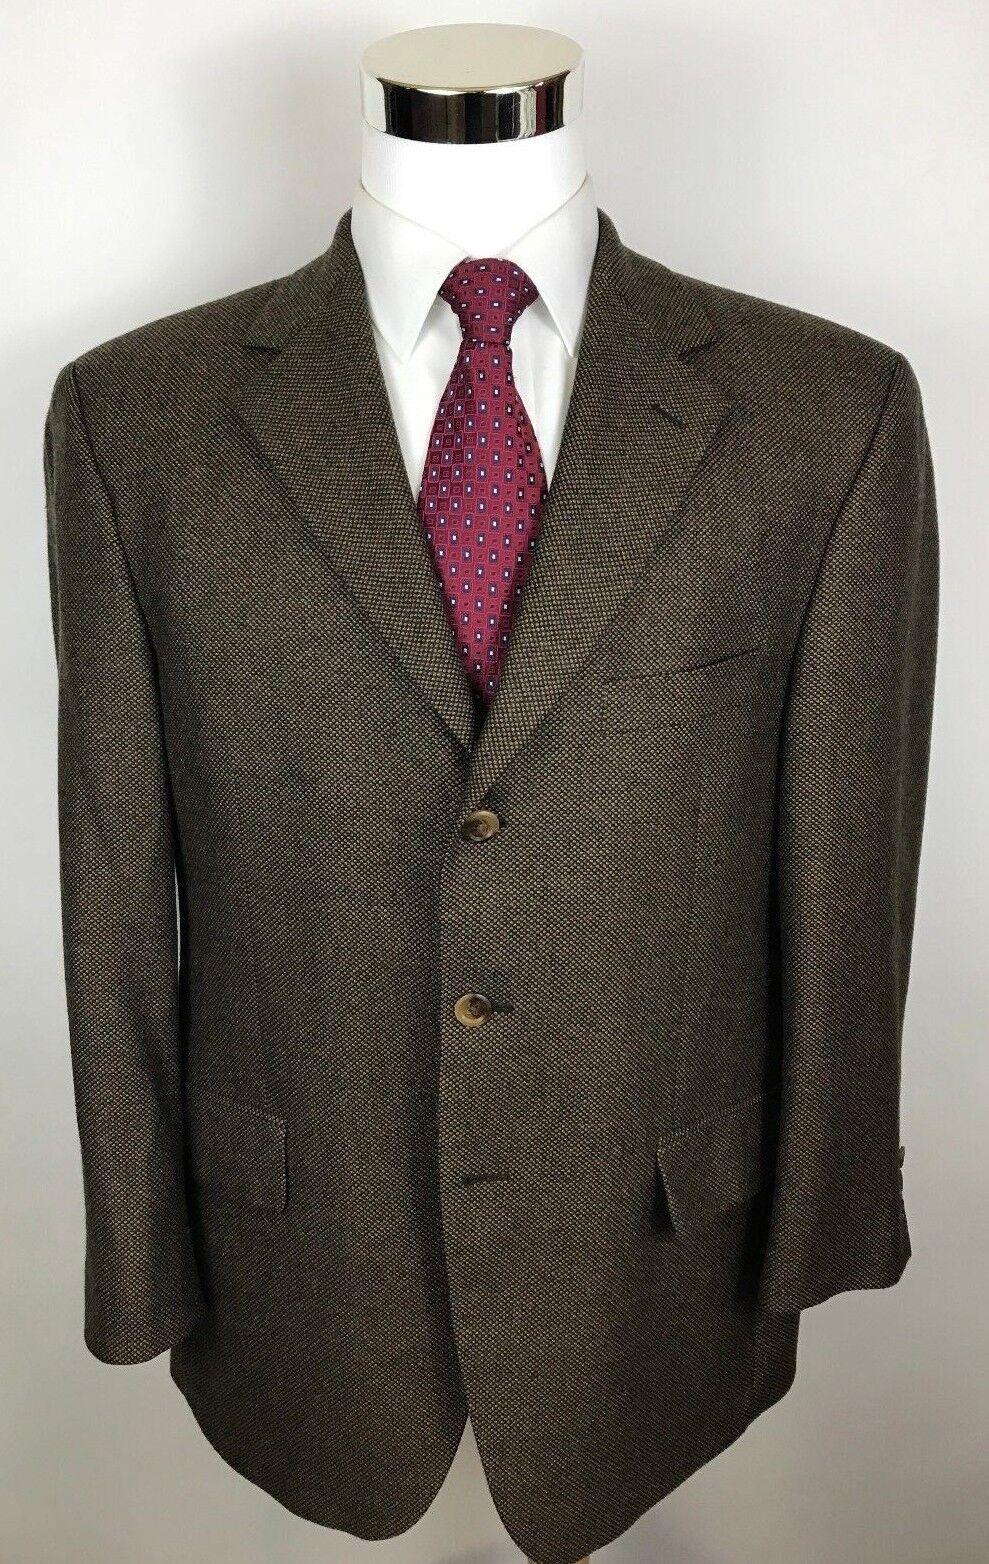 John W Nordstrom Lgold Piana Cashmere Brown Birdseye Blazer Sport Coat Men's 42R